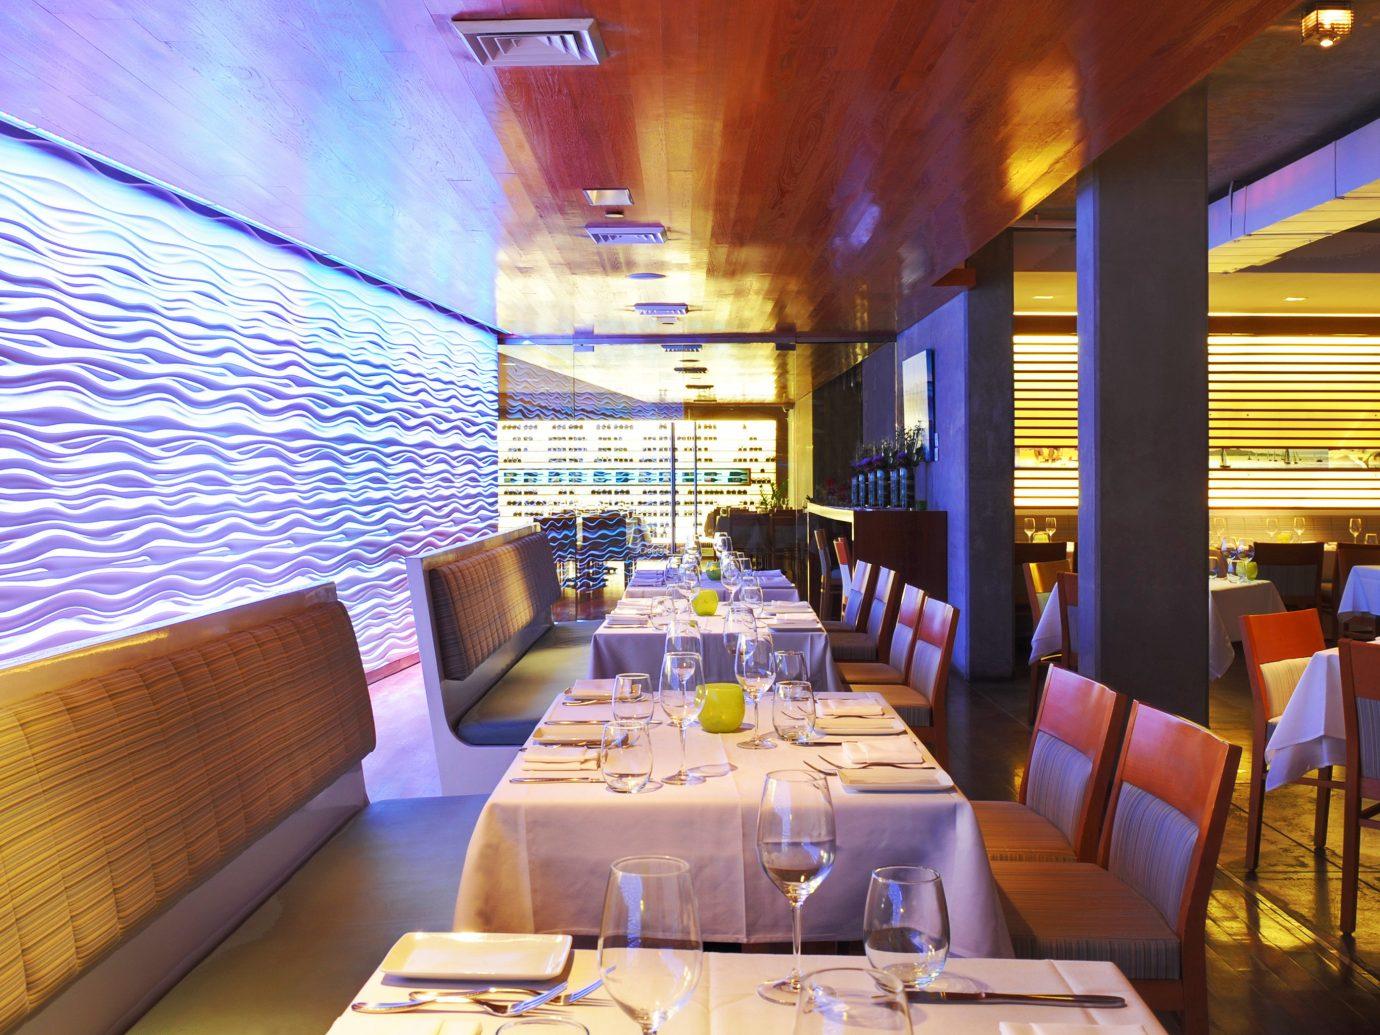 Beach Beachfront Dining Drink Eat Resort table indoor room restaurant window function hall interior design meal convention center yacht Bar furniture